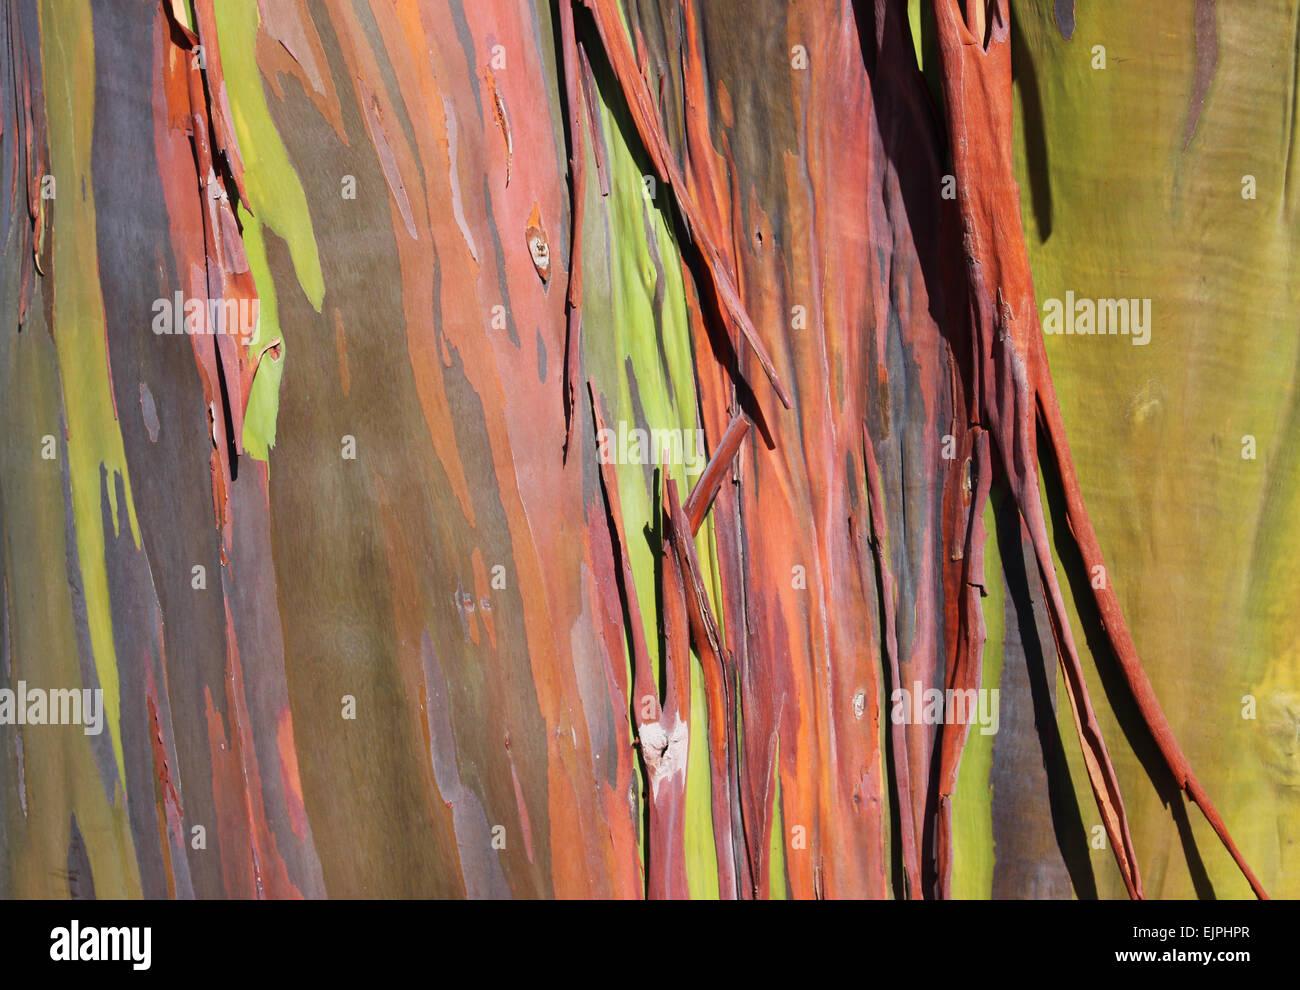 Rainbow Eucalyptus tree (Eucalyptus Deglupta) found in San Diego, California. - Stock Image